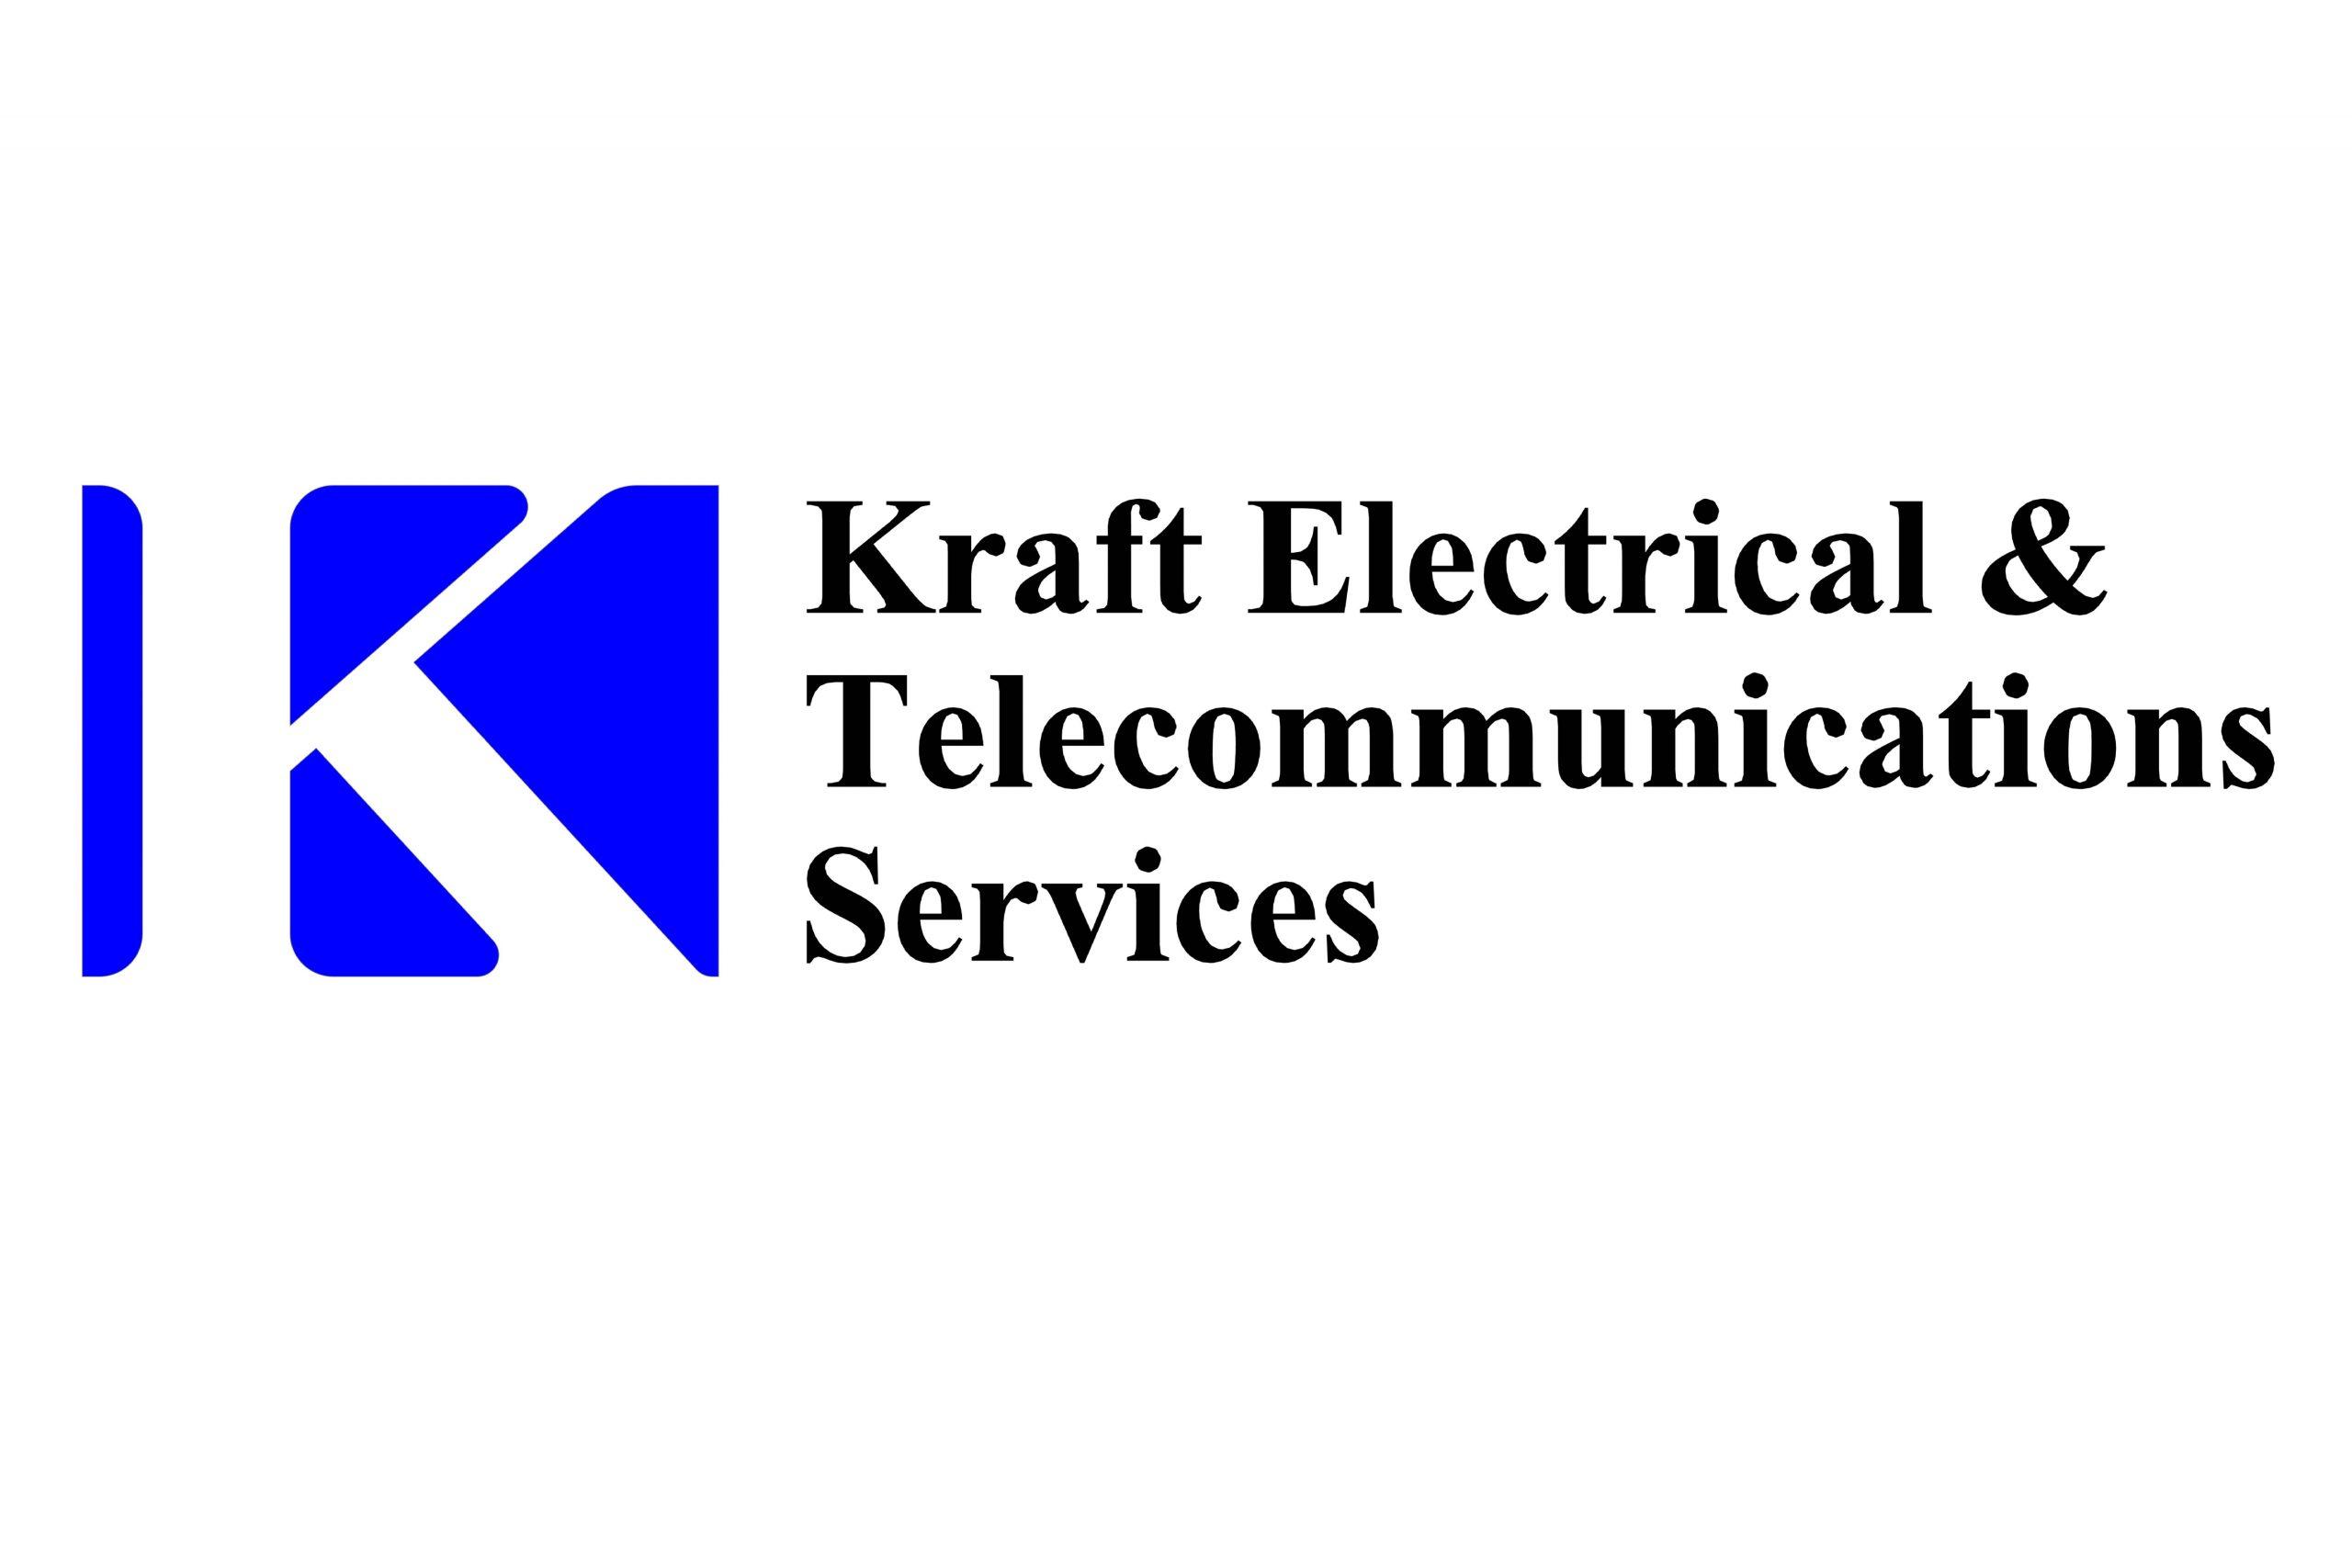 Kraft Electrical & Telecommunication Services